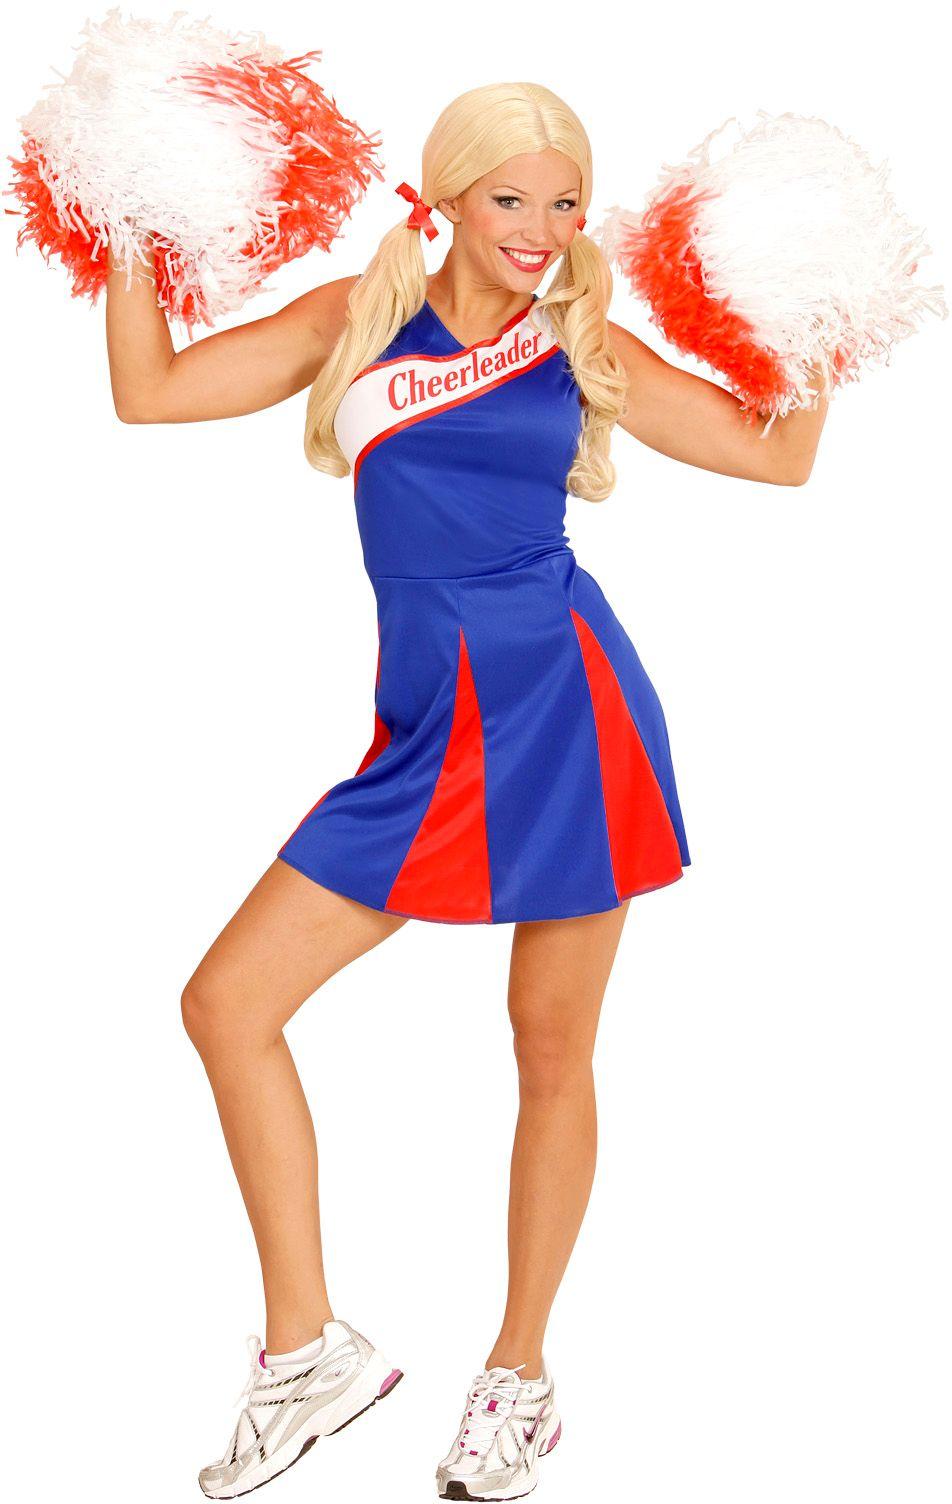 Cheerleader jurkje blauw rood